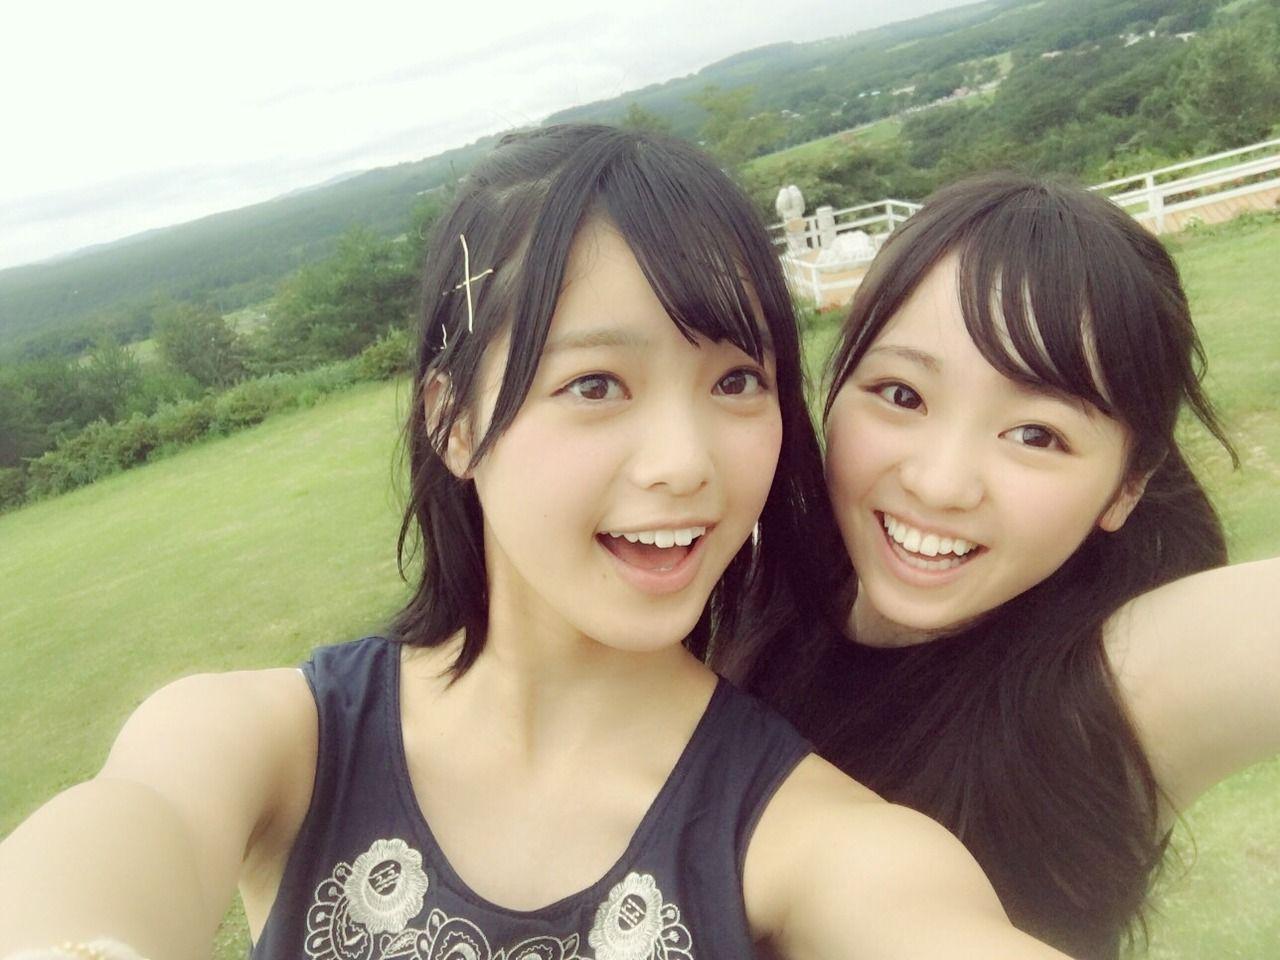 欅坂: 欅坂46 公式ブログ